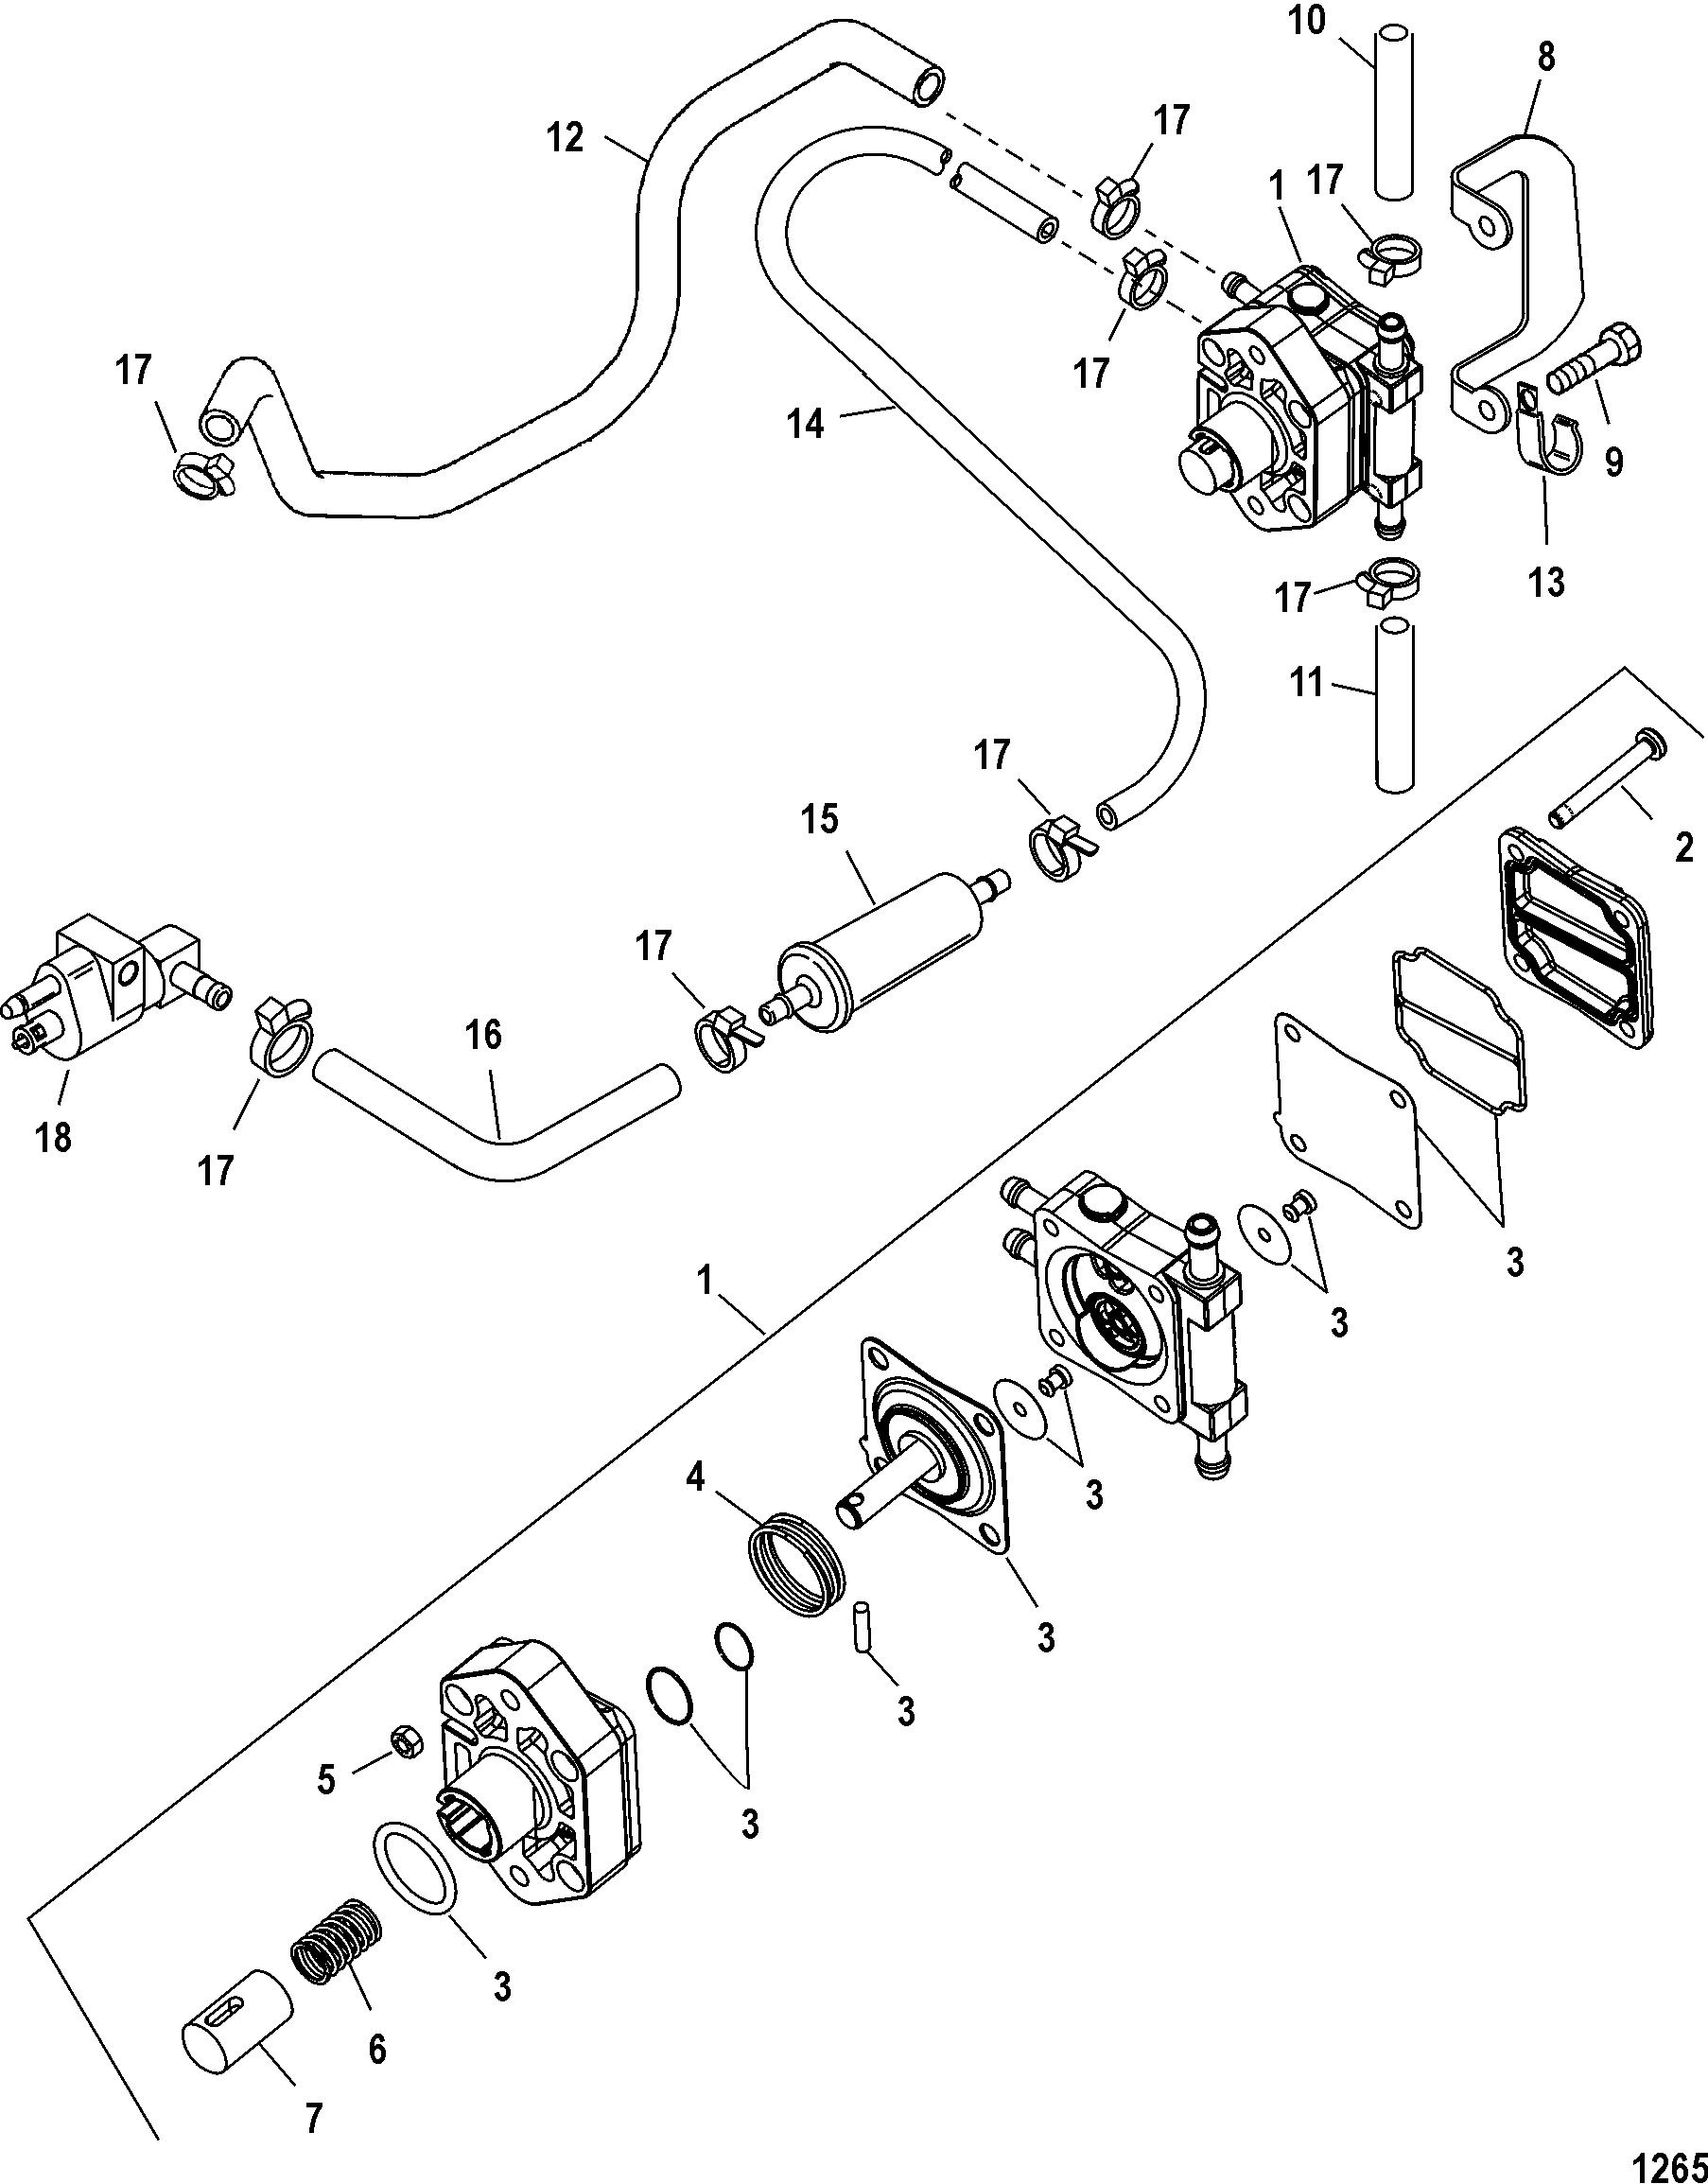 Fuel Pump For Mariner Mercury 30 40 3 Cyl Carb 4 Stroke